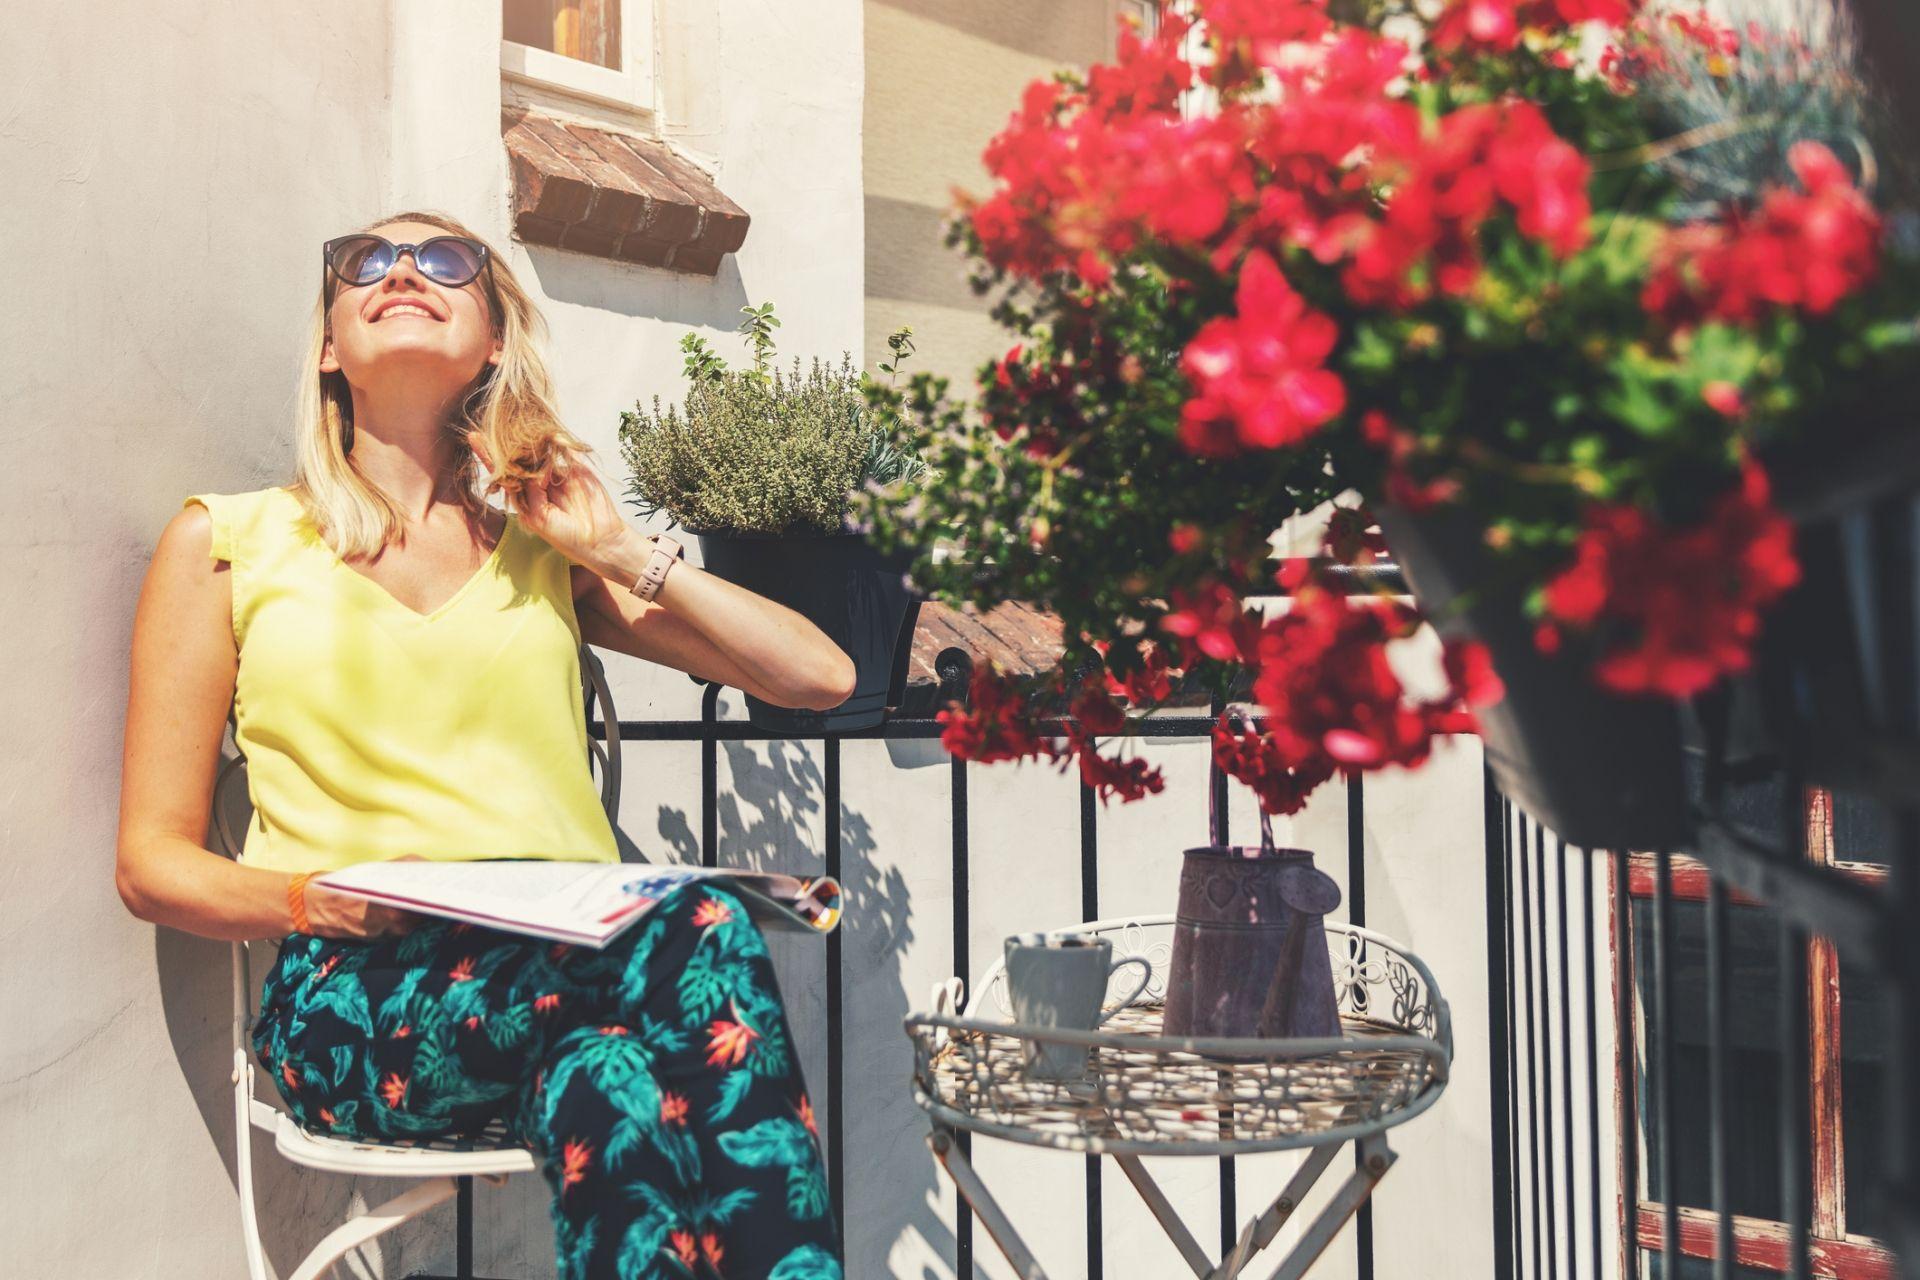 Consejos útiles para combatir la falta de Vitamina D durante la cuarentena